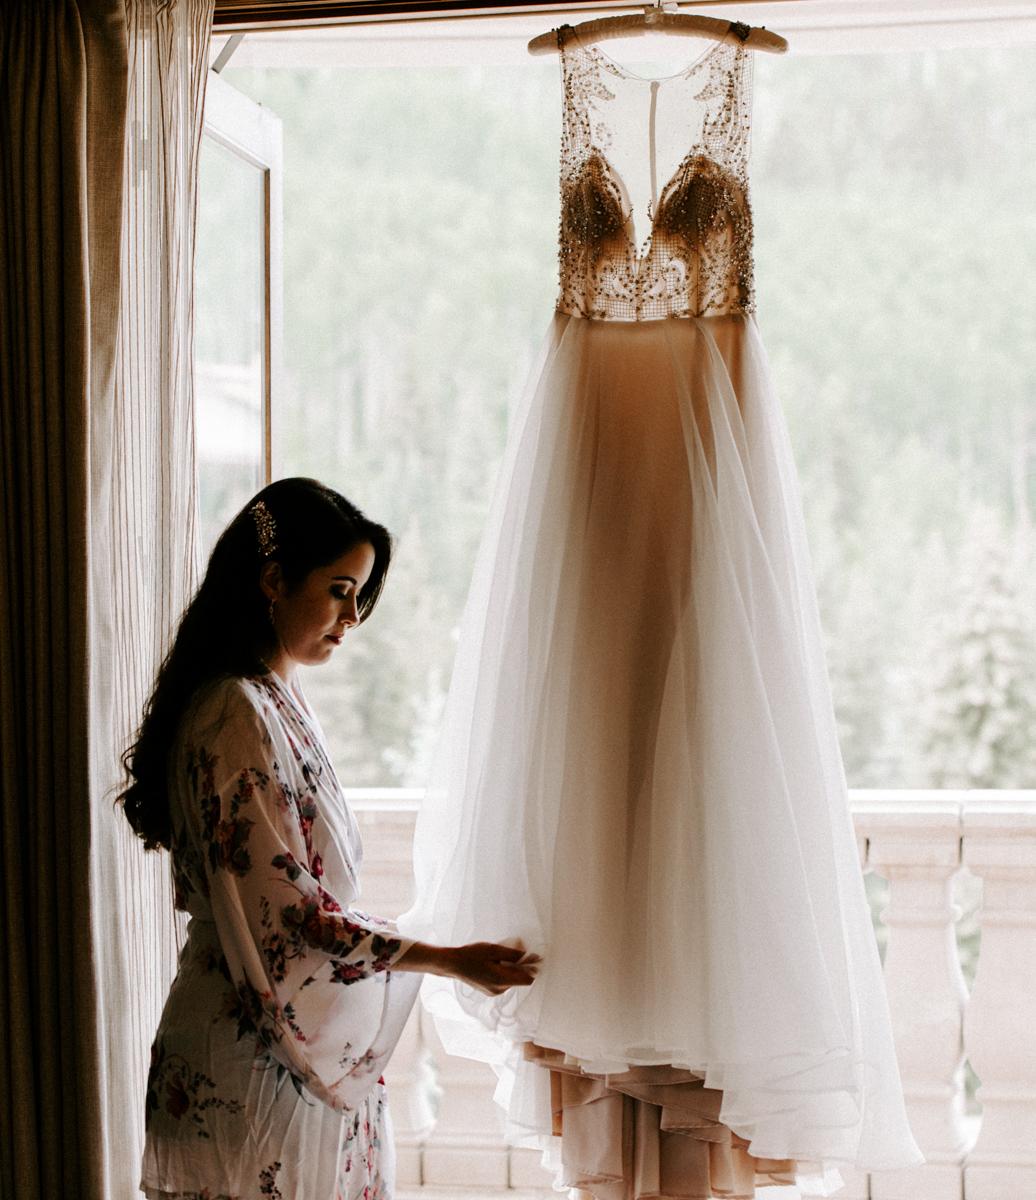 sara bridesmaids get ready at the arabelle hotel in vail colorado-7.jpg